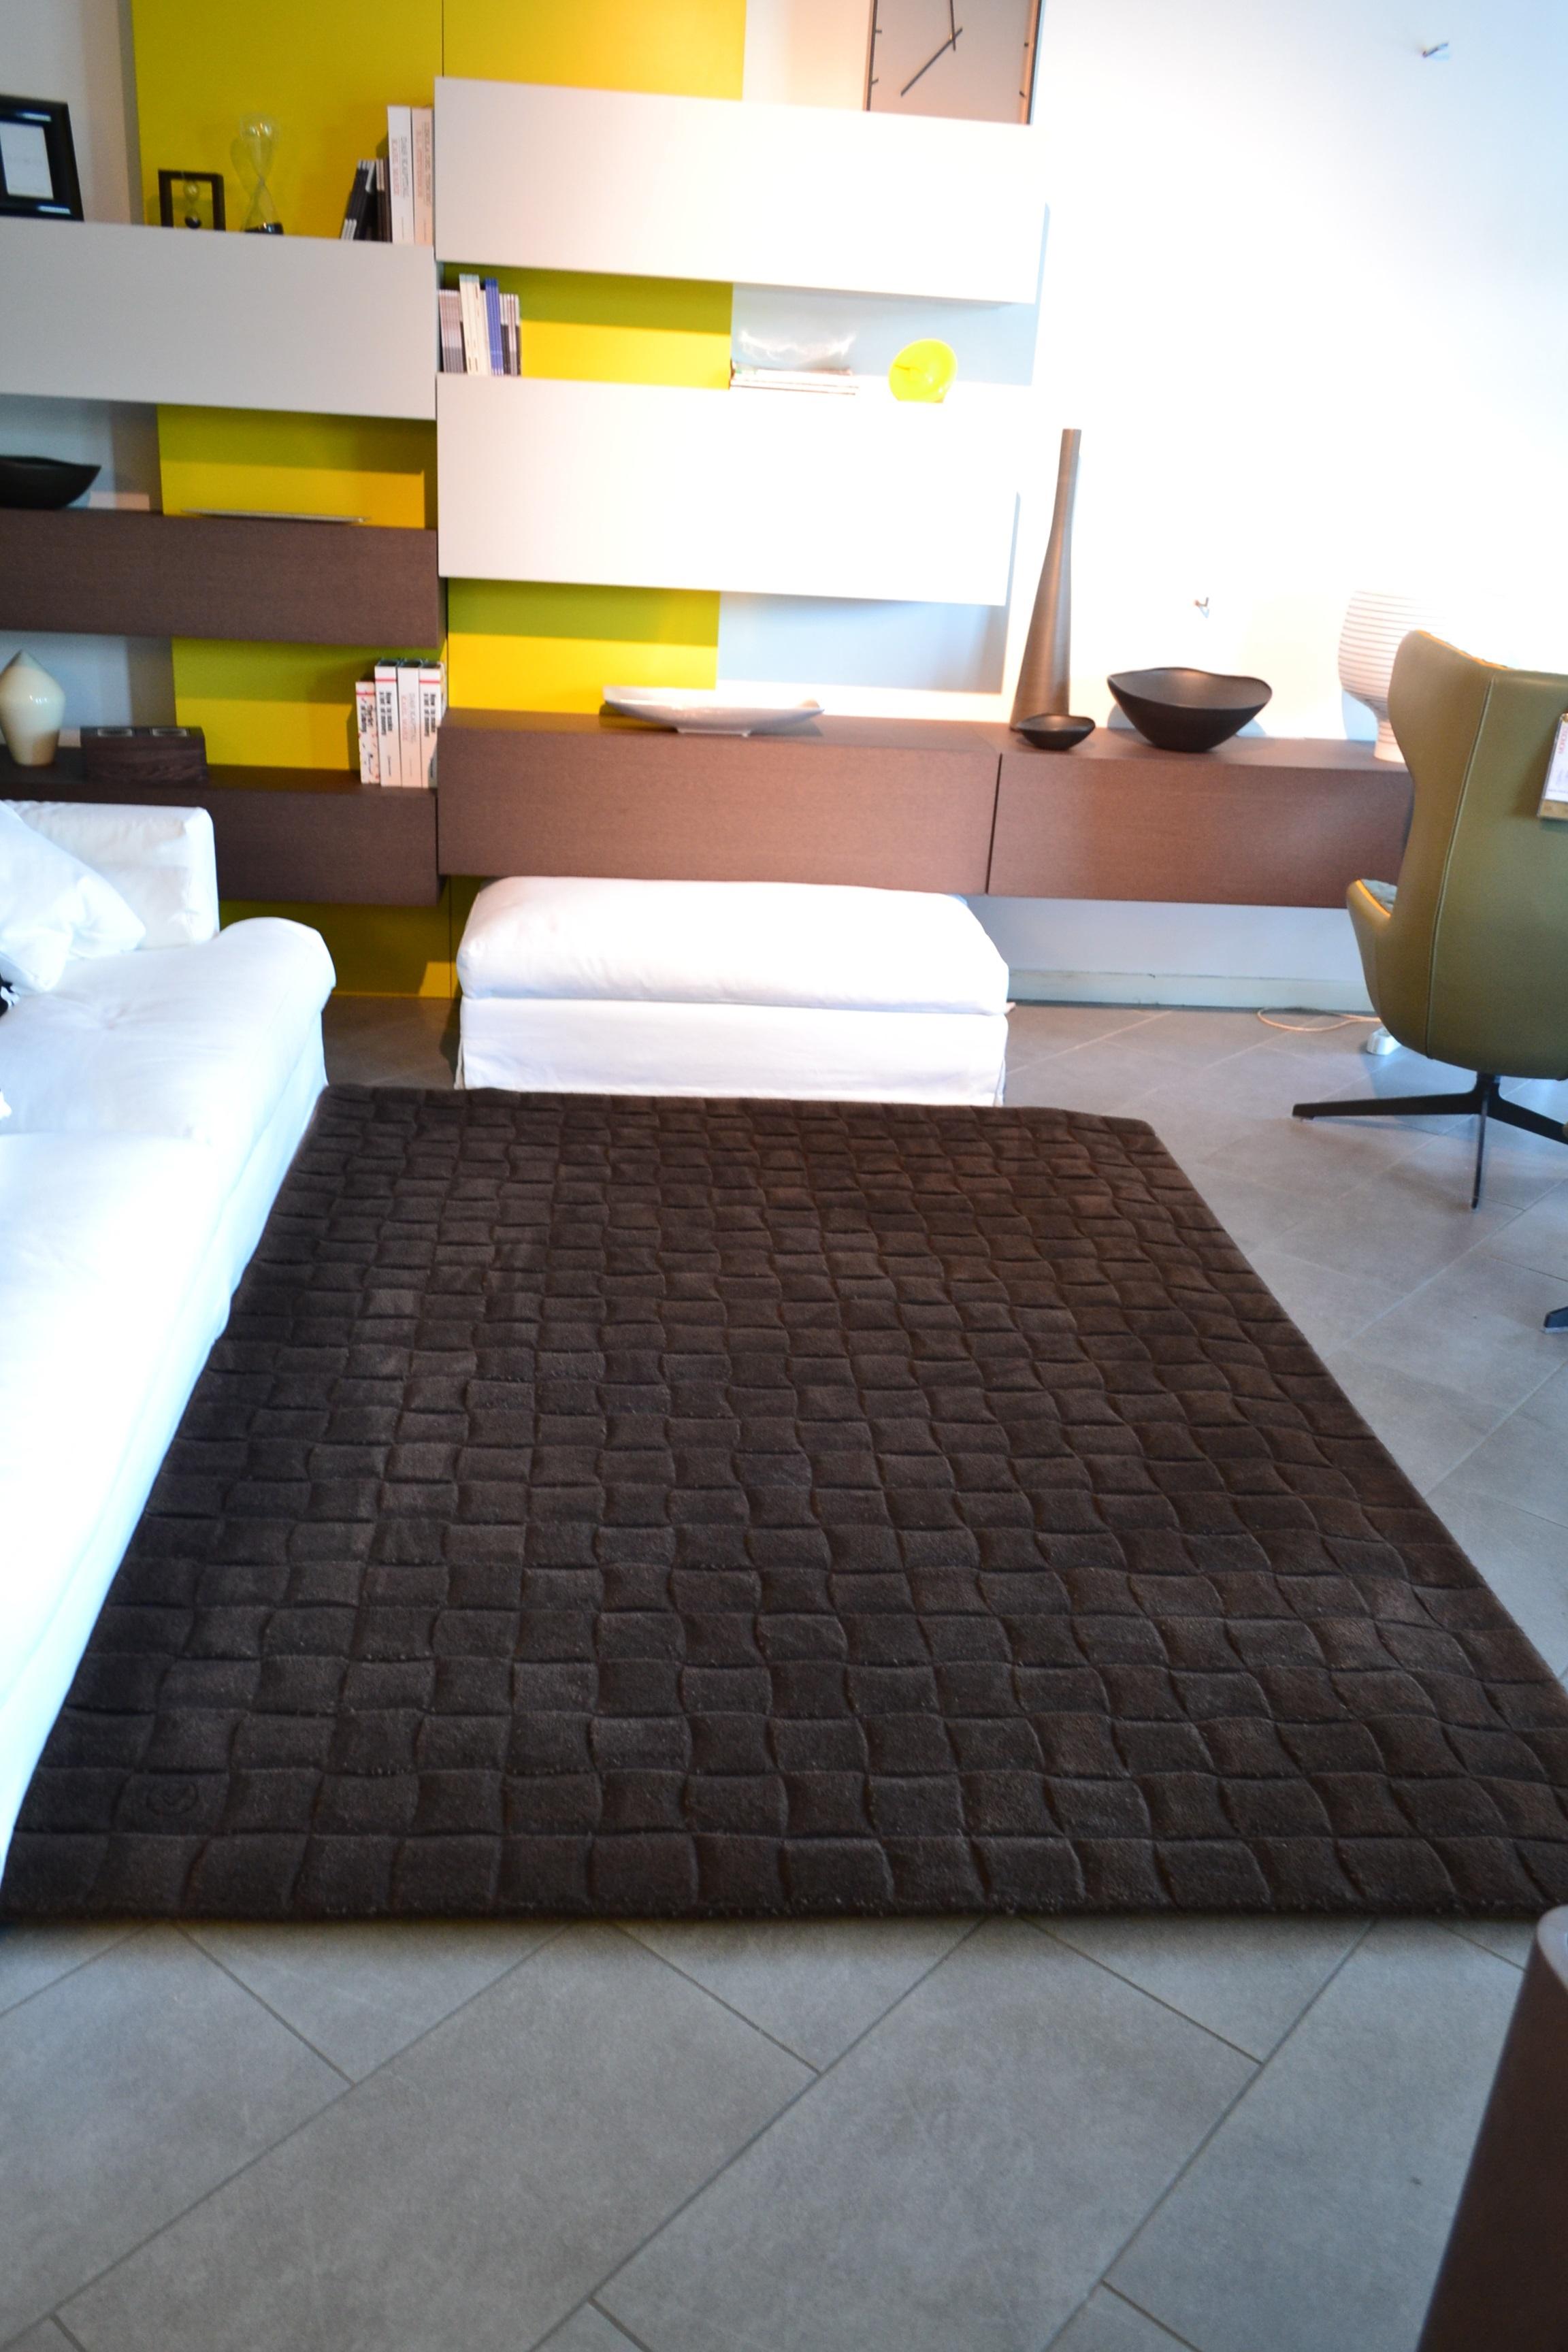 Soggiorni Moderni Ravenna : Tappeto san brown tappeti a prezzi scontati